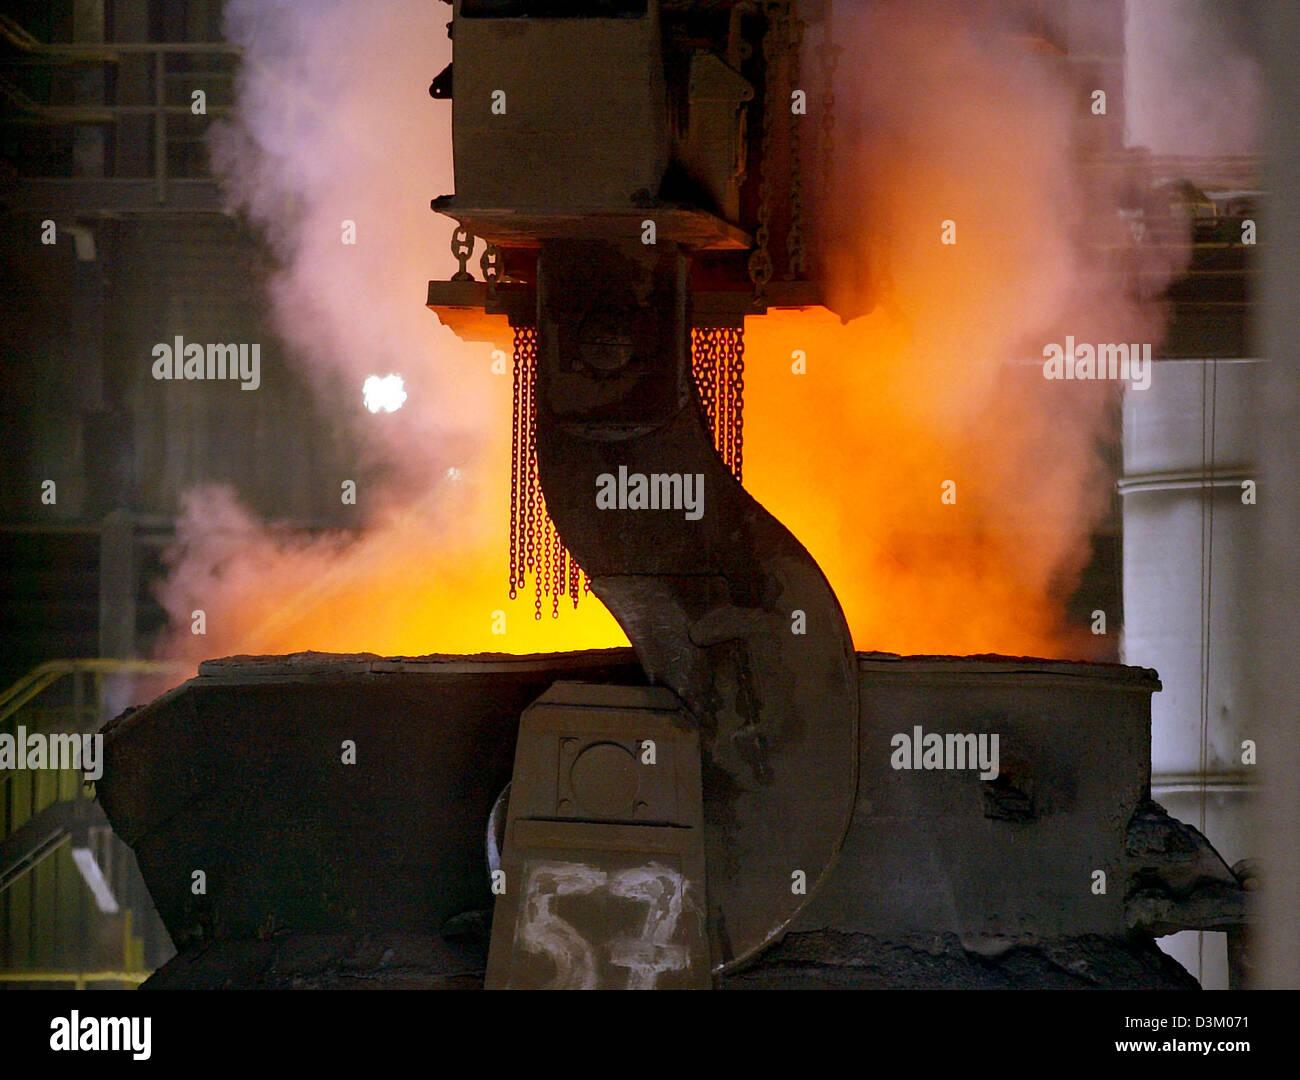 steel mill thyssenkrupp duisburg germany stockfotos steel mill thyssenkrupp duisburg germany. Black Bedroom Furniture Sets. Home Design Ideas